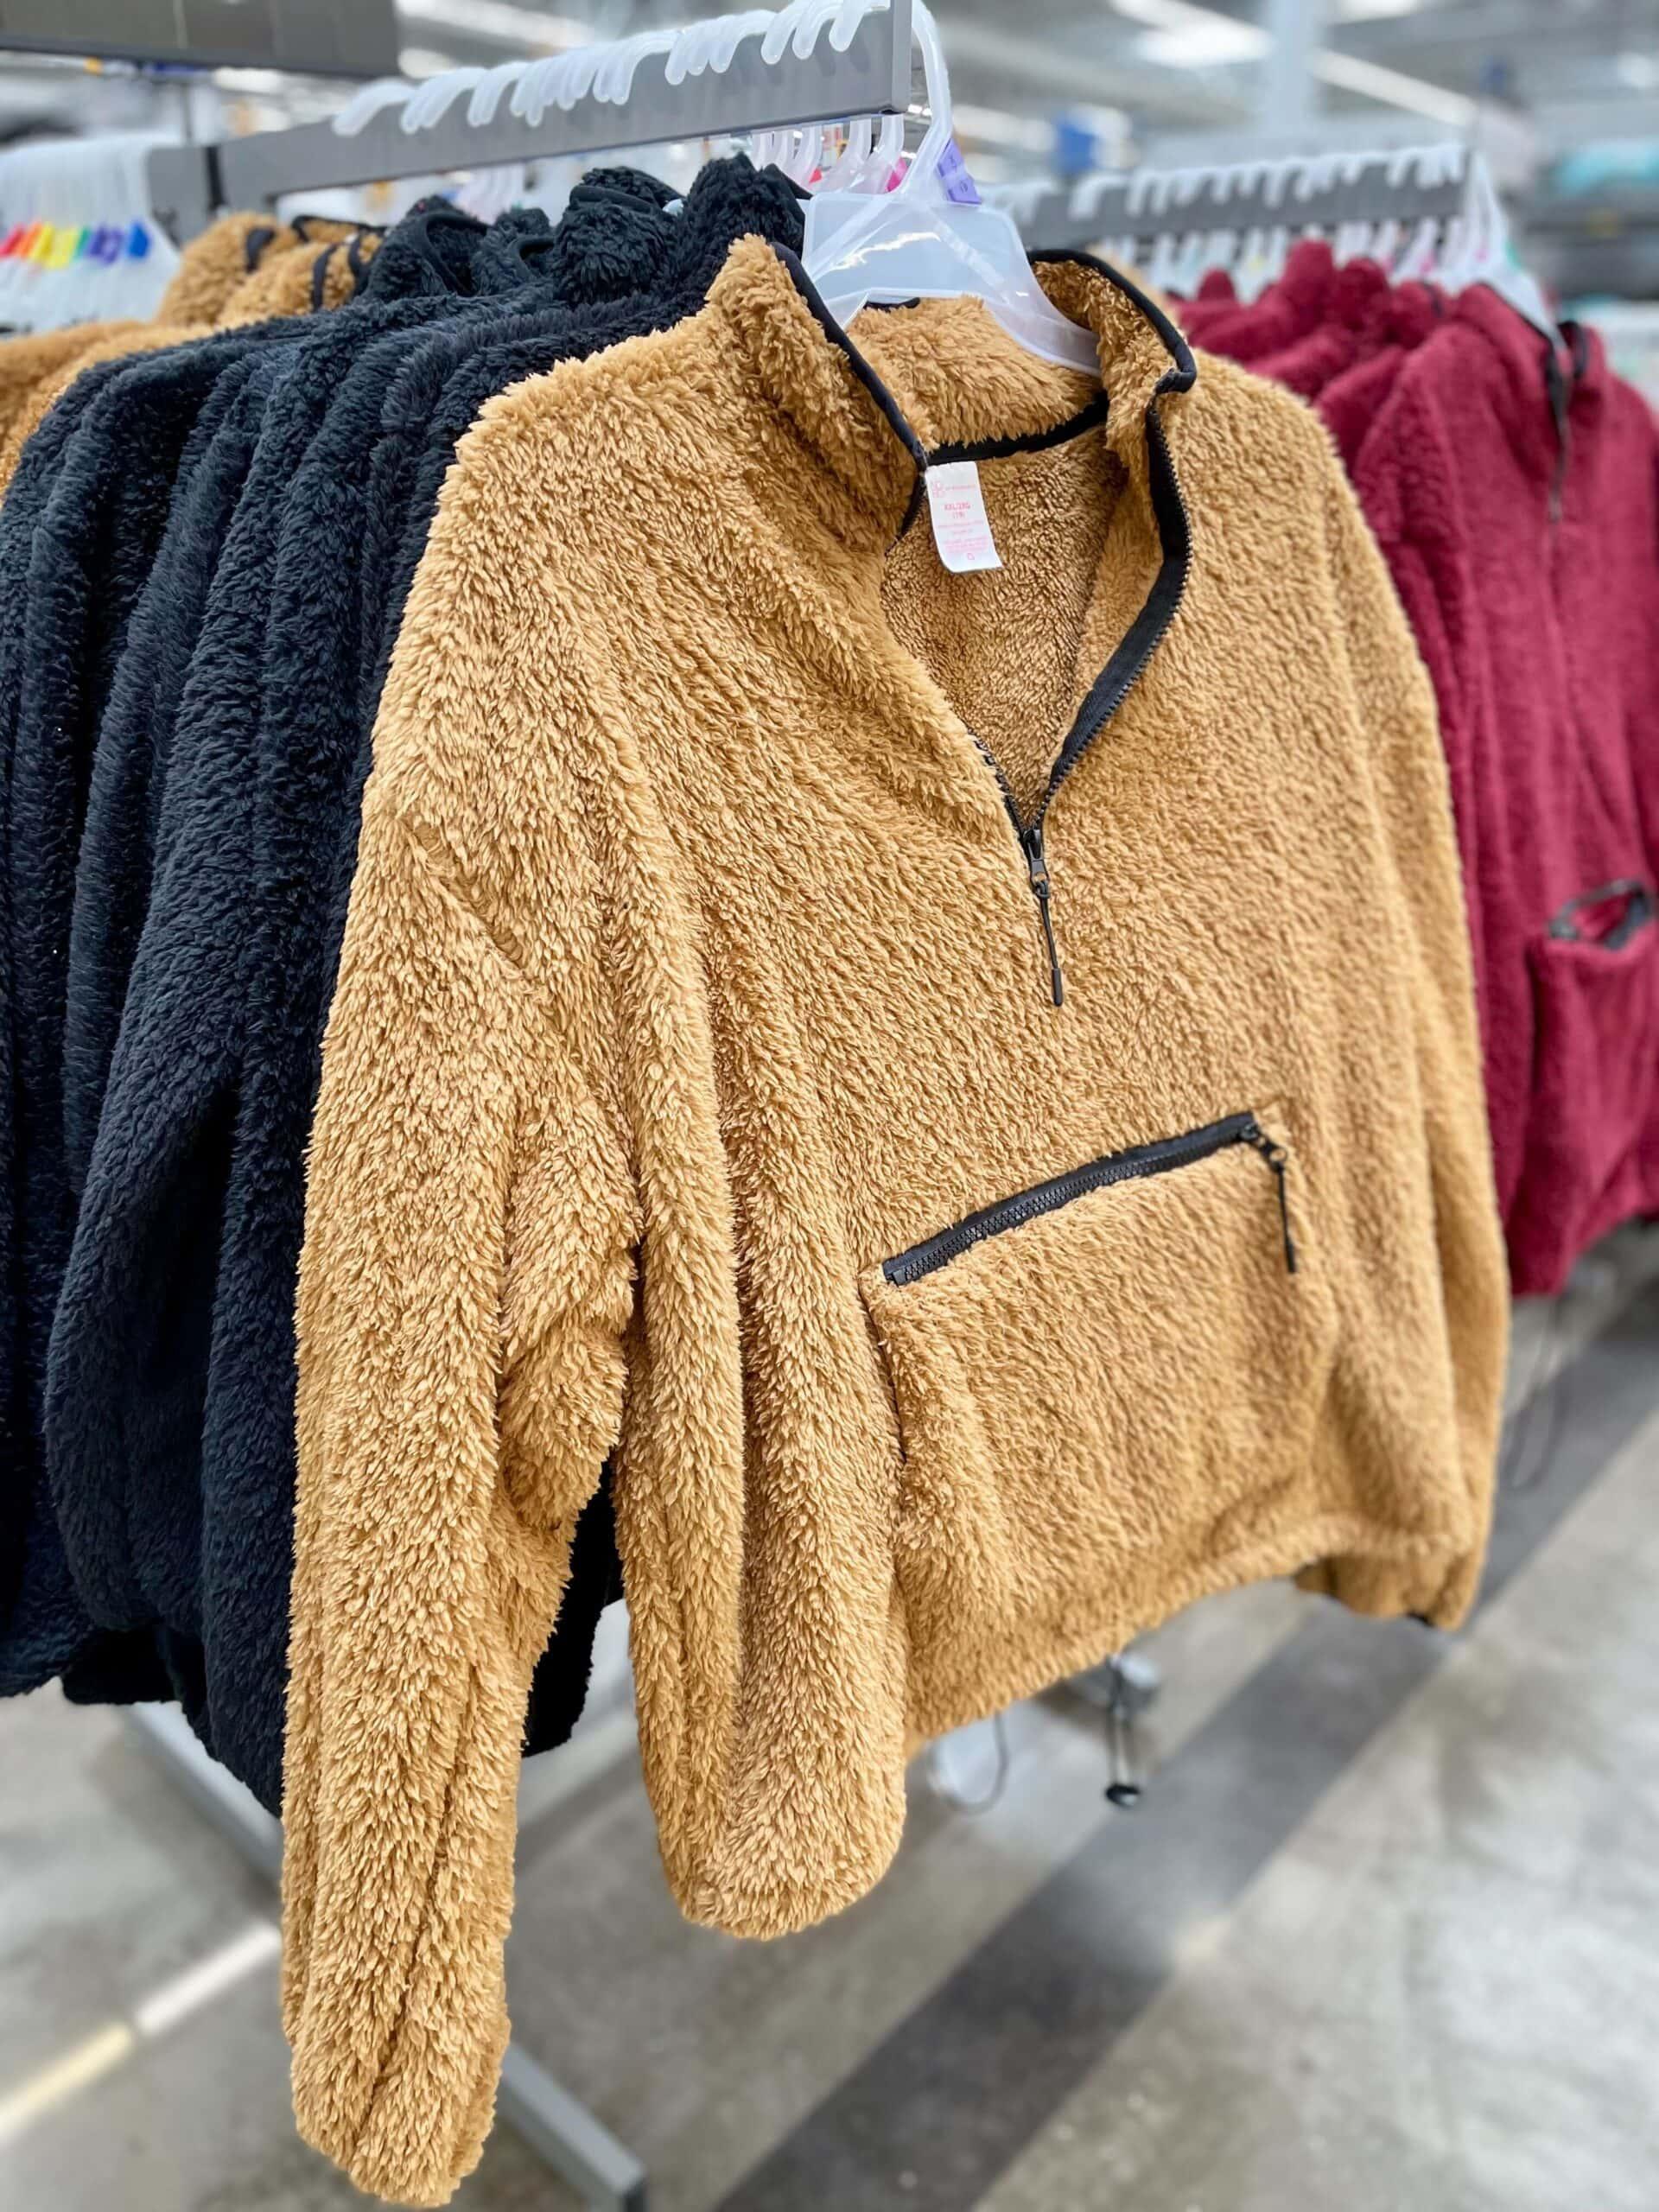 walmart clothing